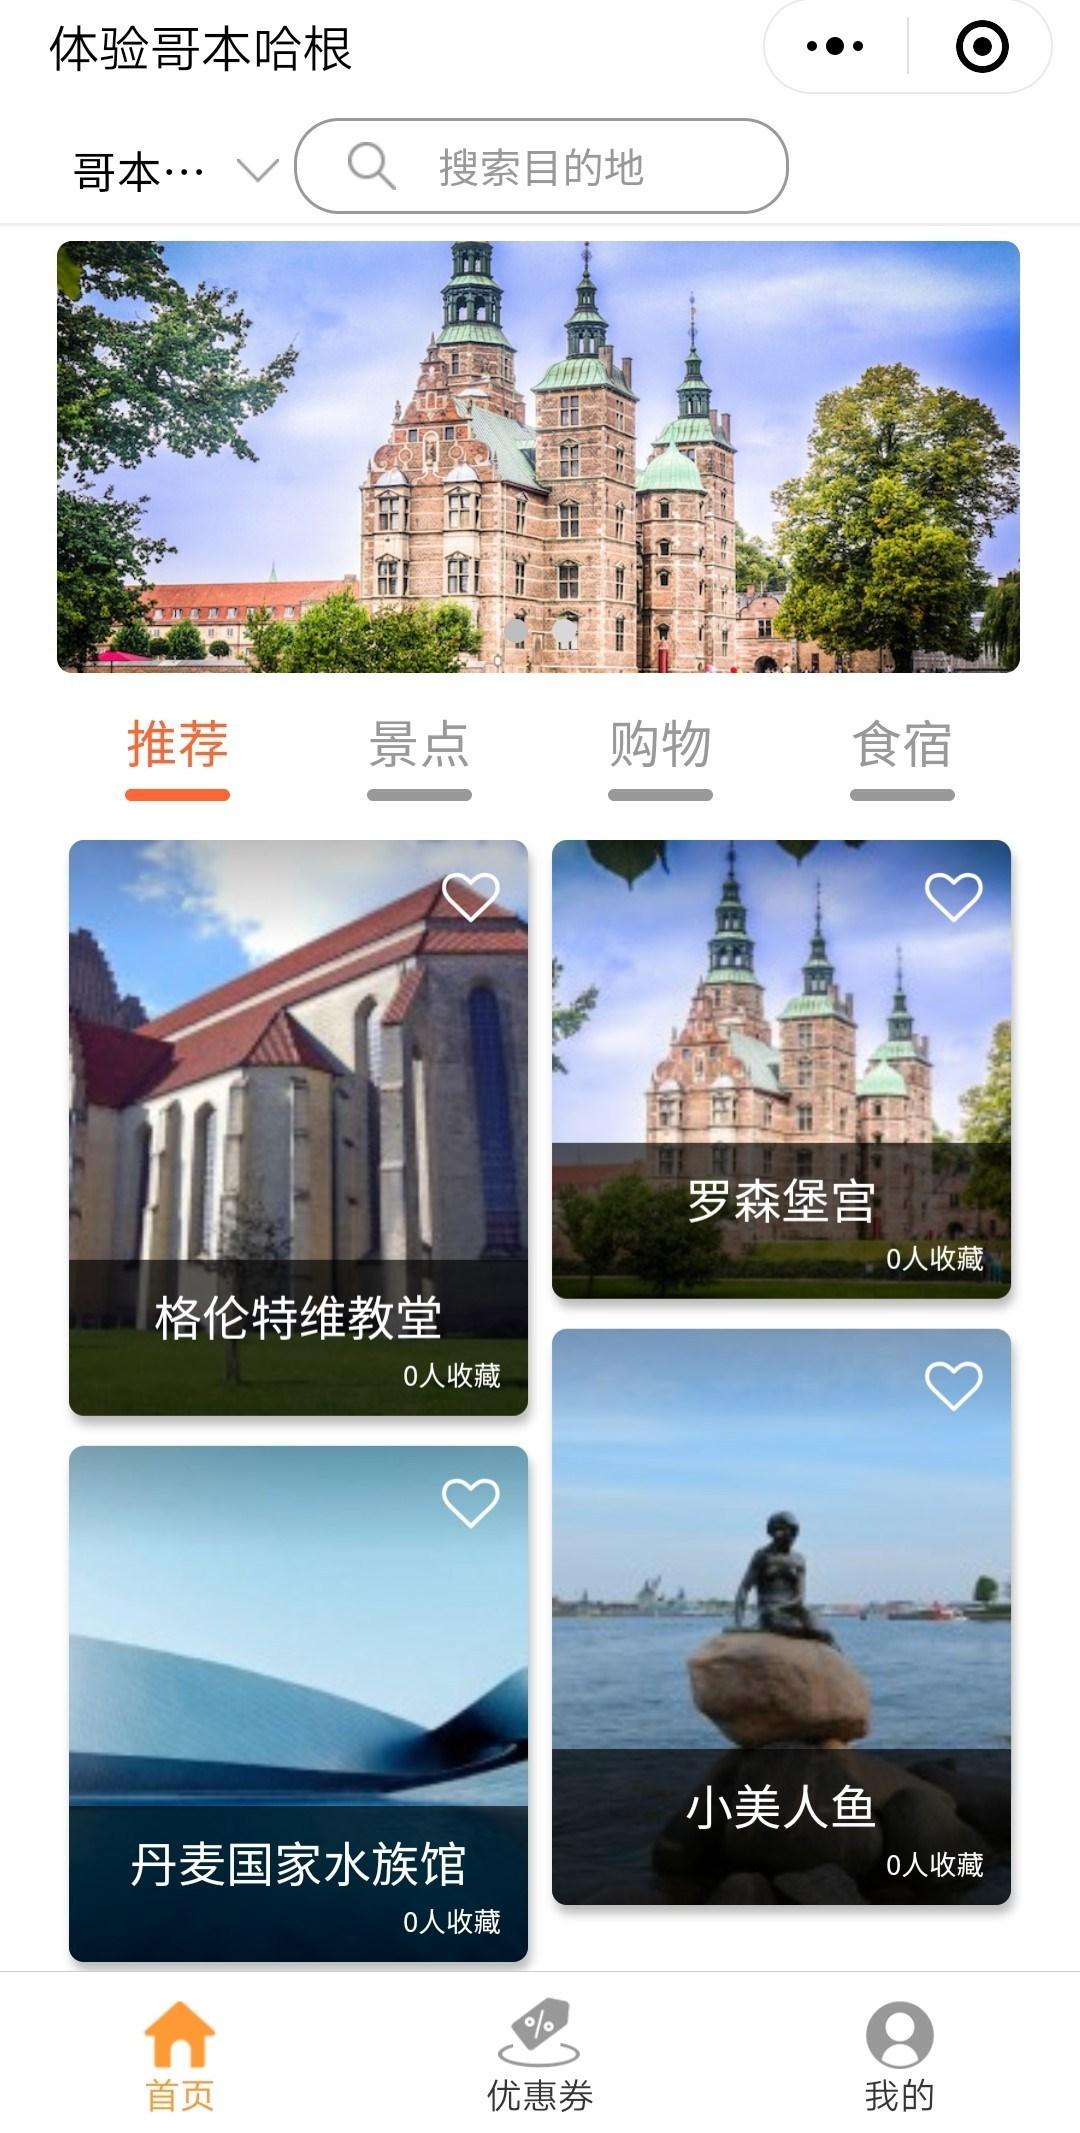 Copenhagen Chinese Social Media Platforms Marketing - EuroPass